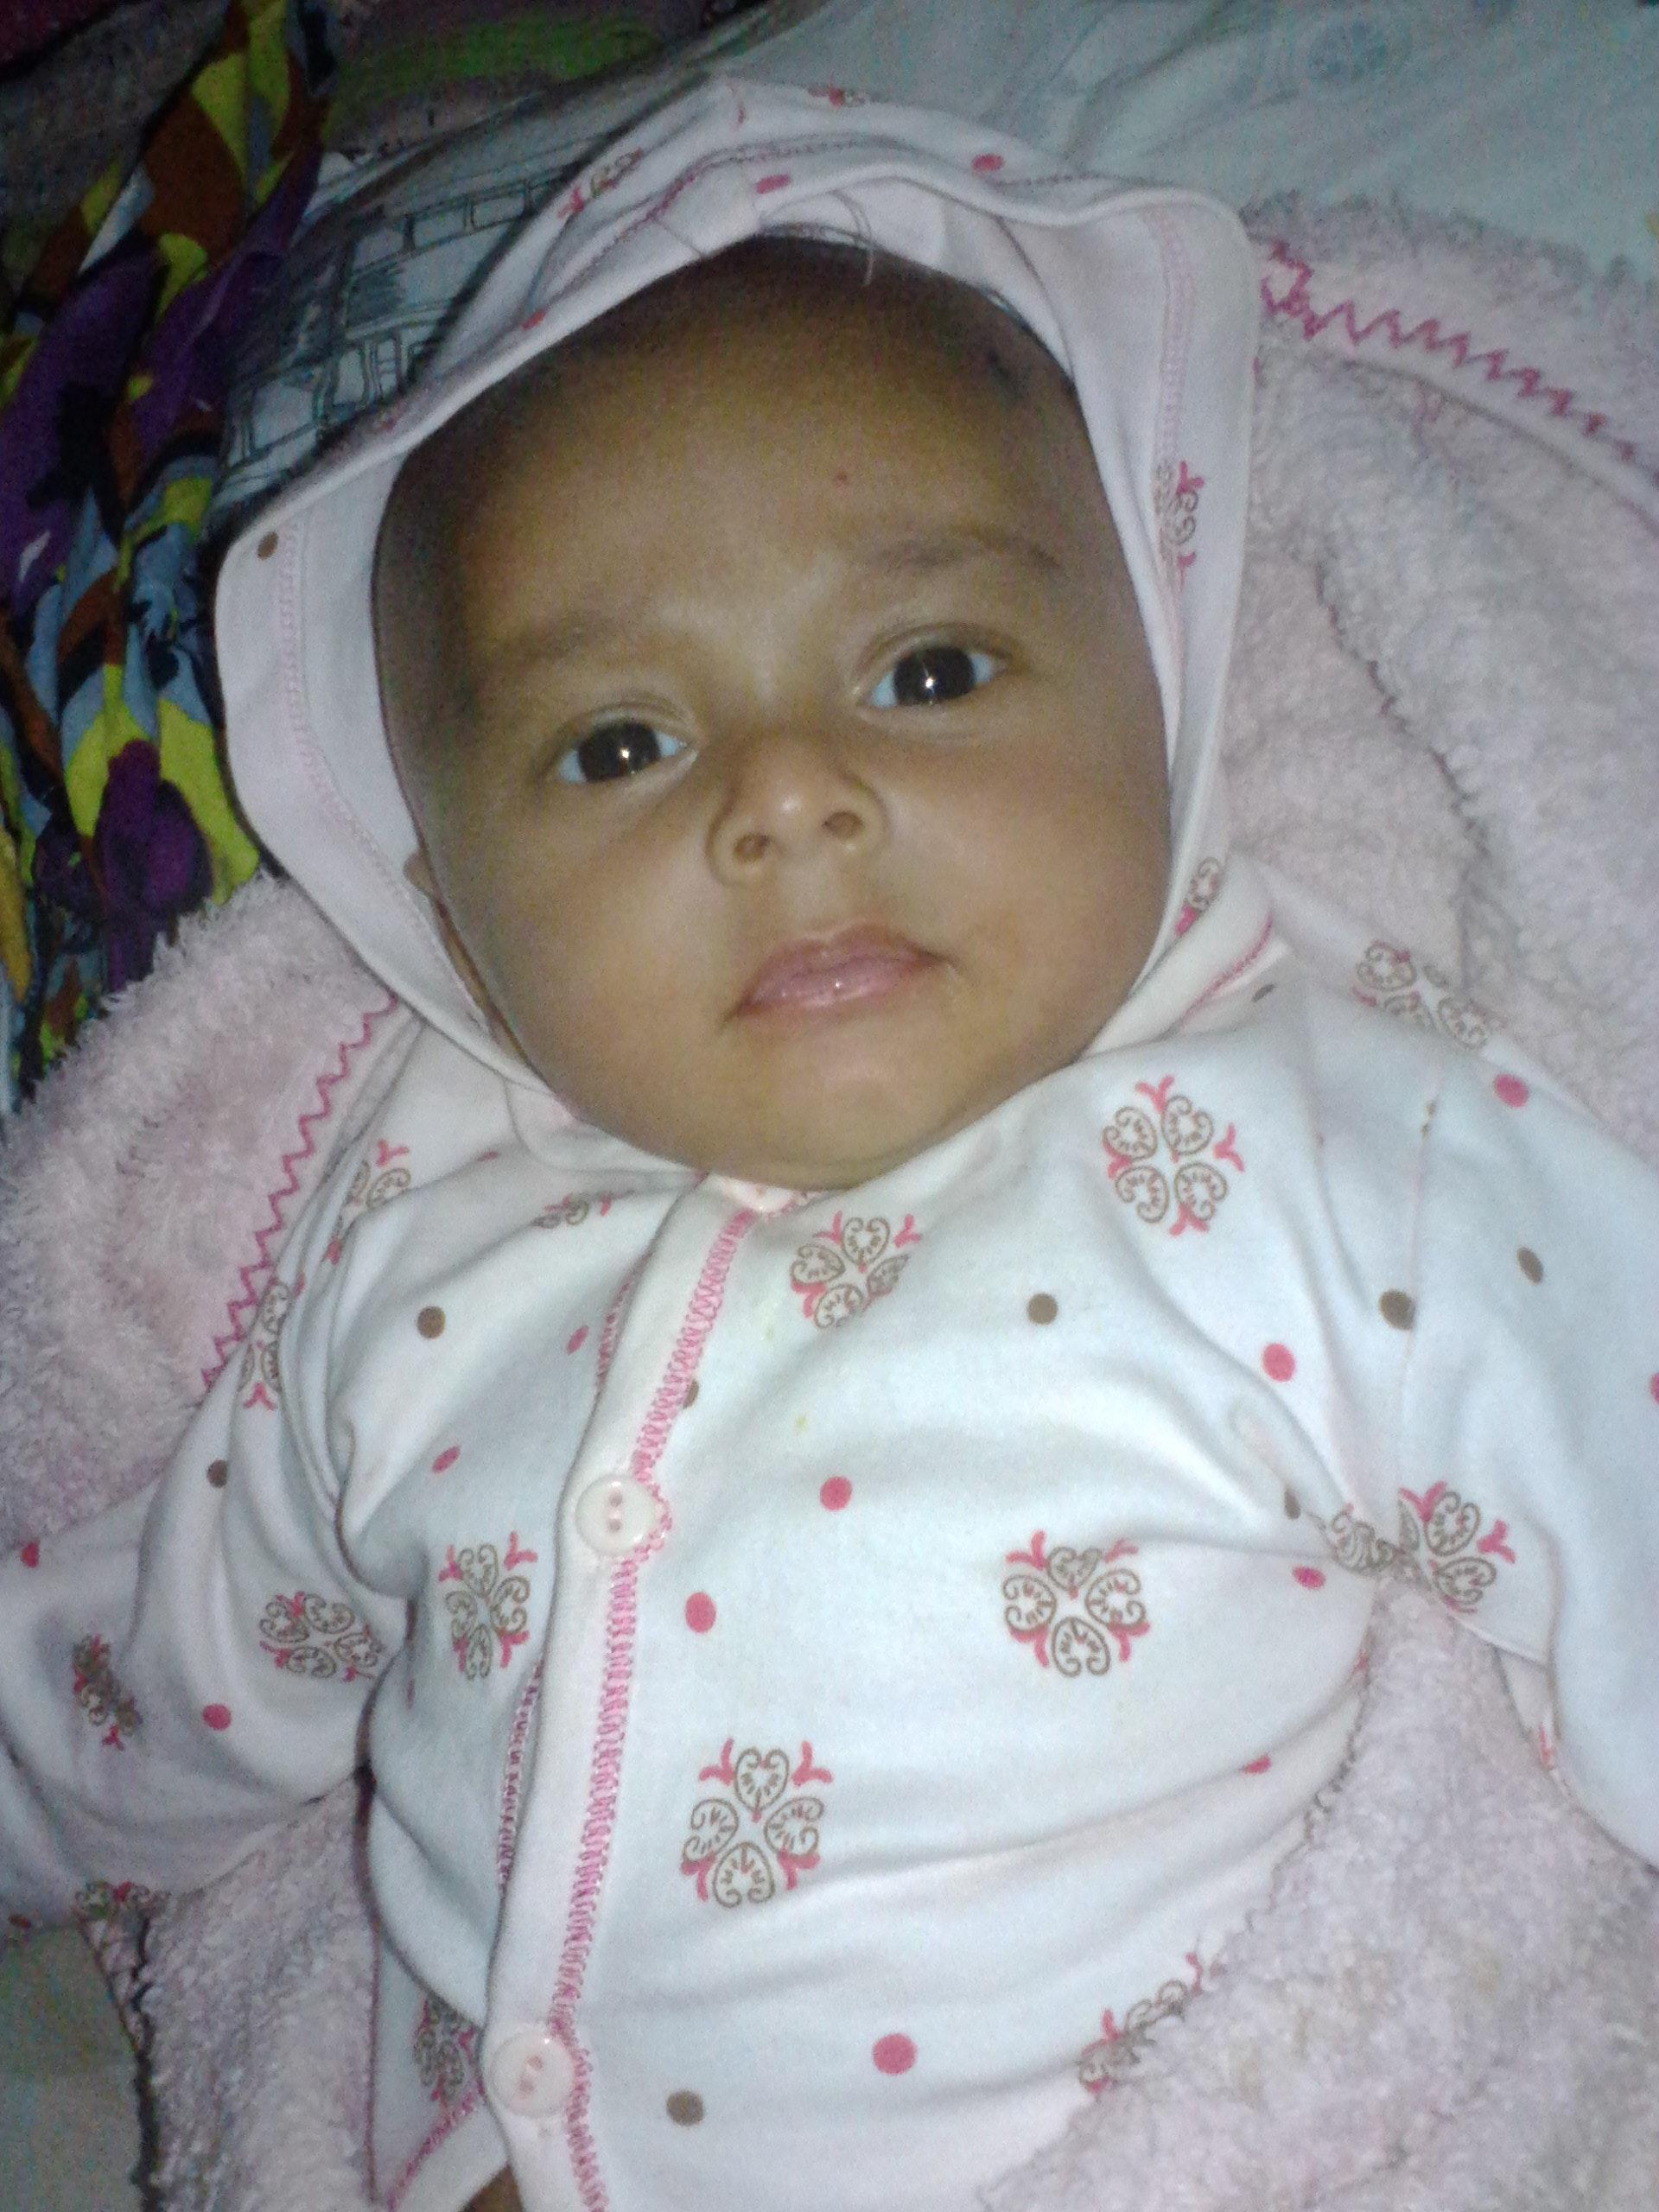 free stock photo of new baby, nice baby